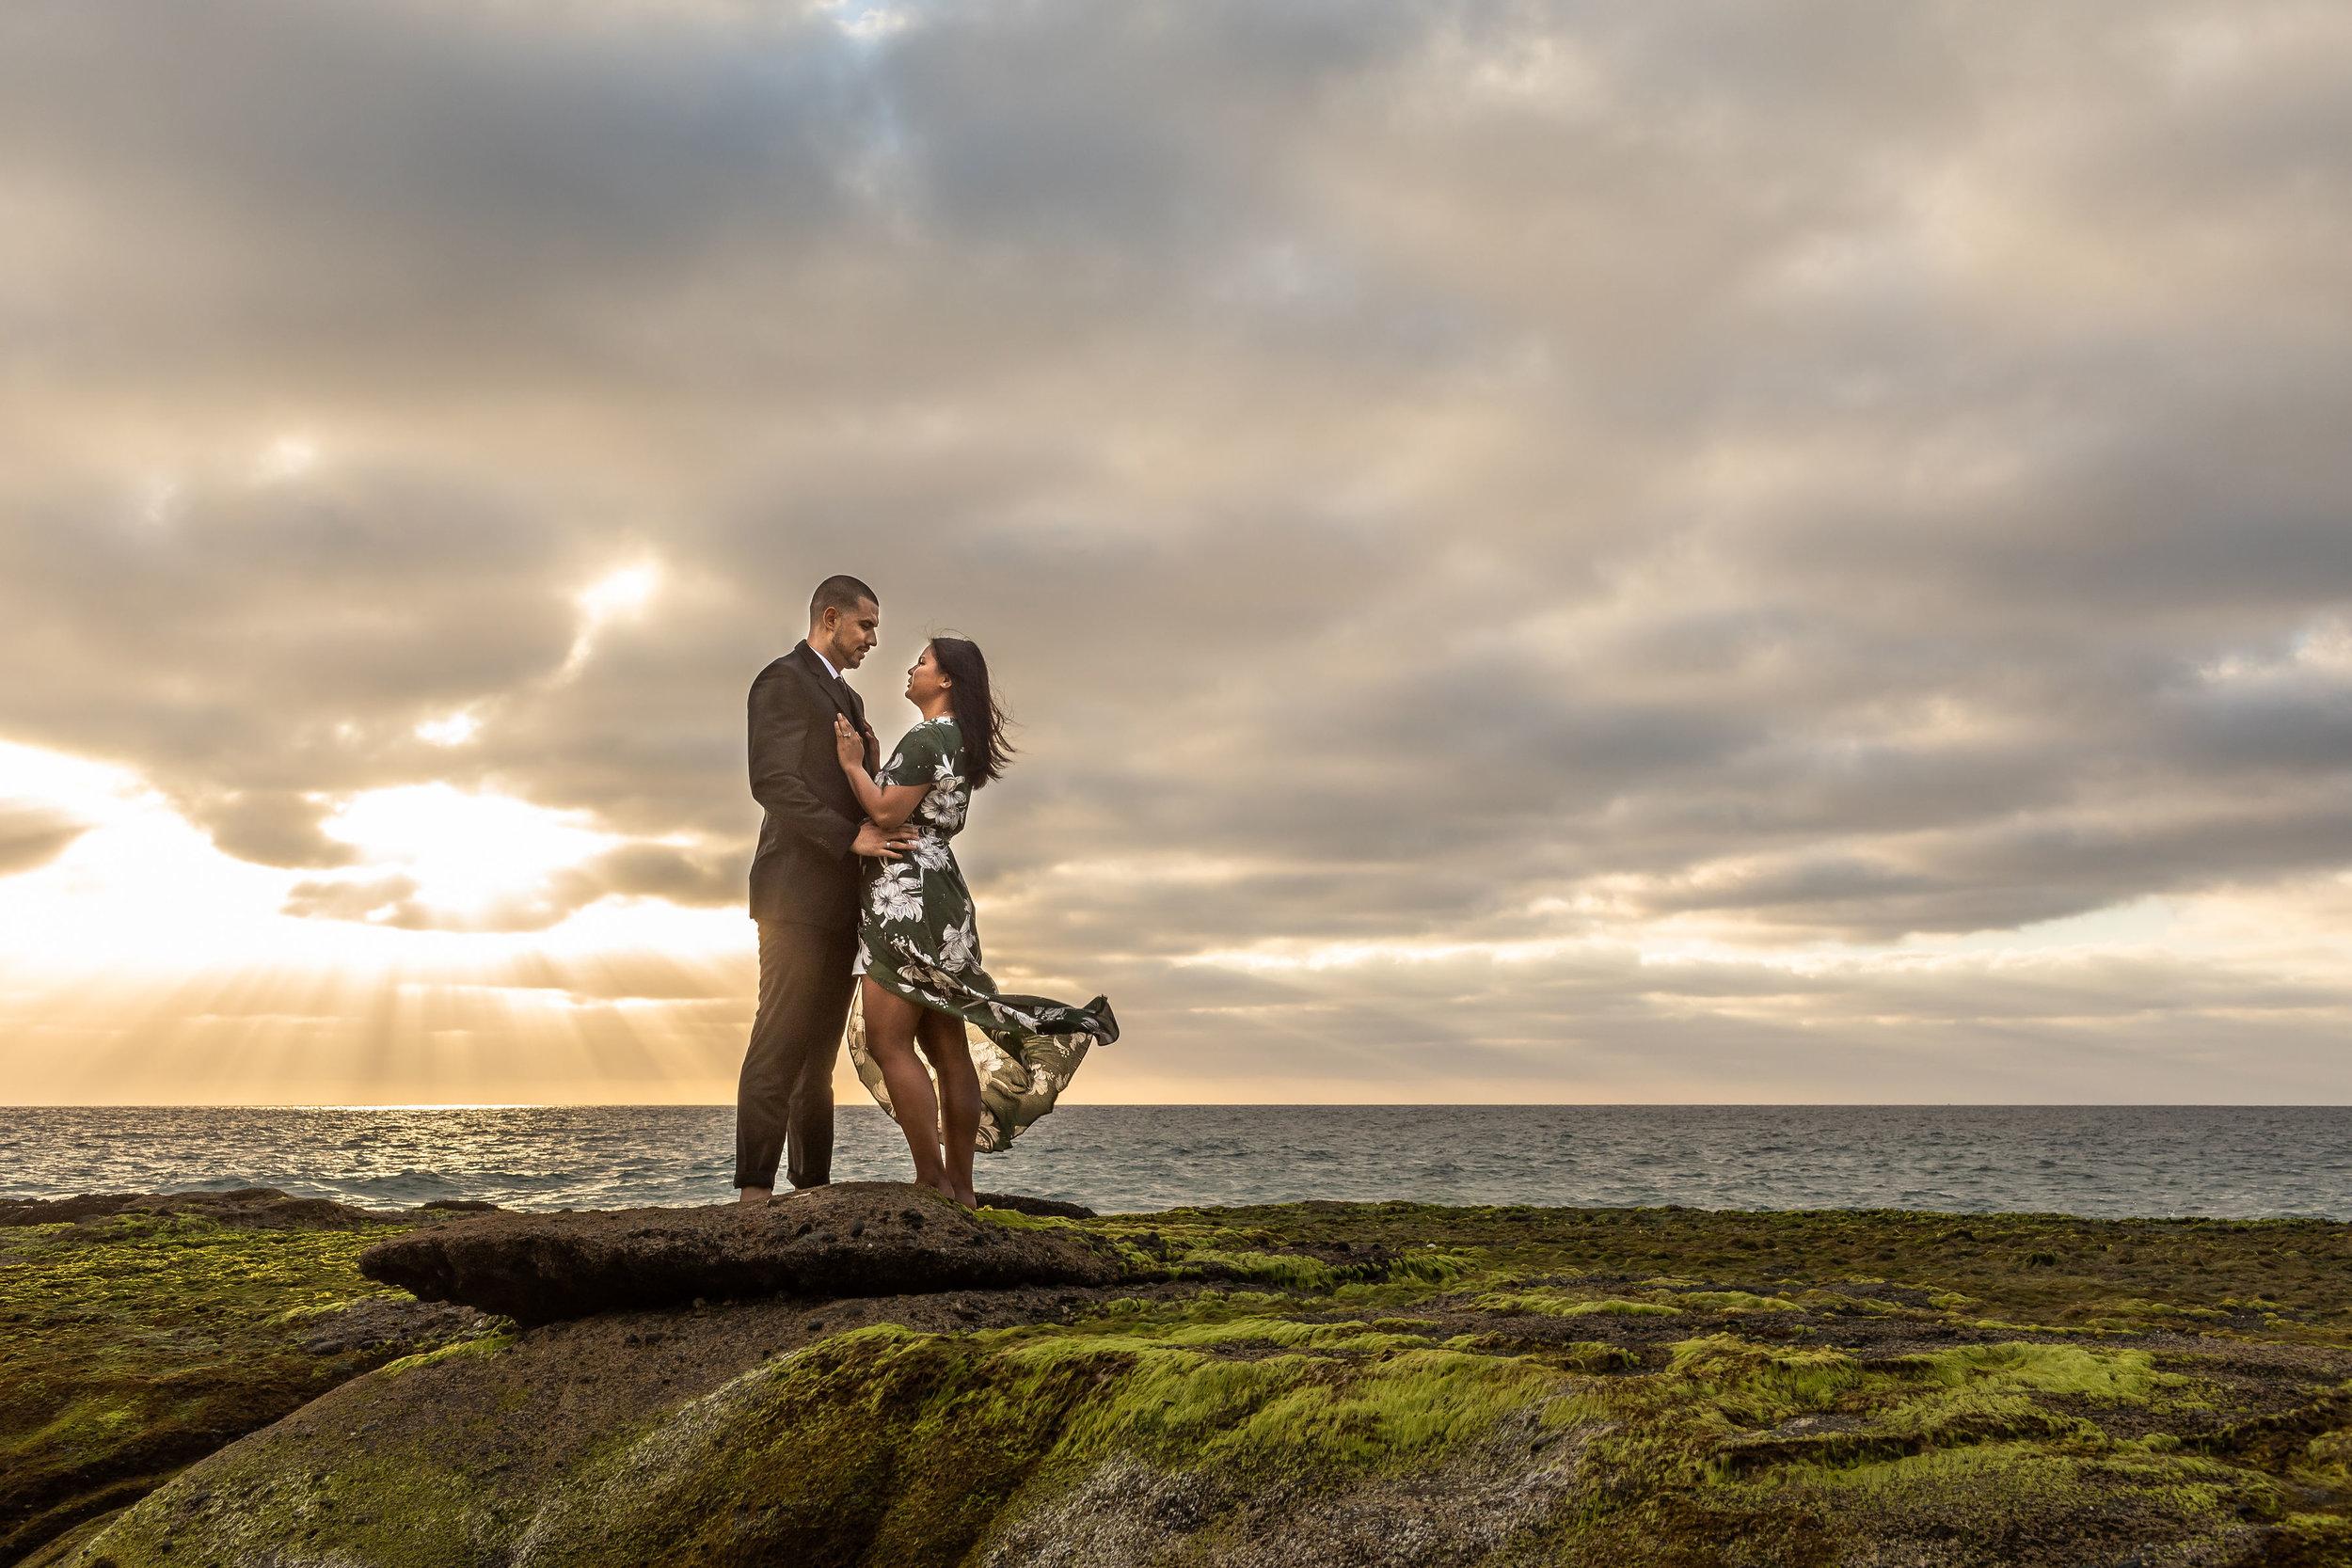 ! Dramatic Artistic Engagement Photo on a Rocky Beach.jpg